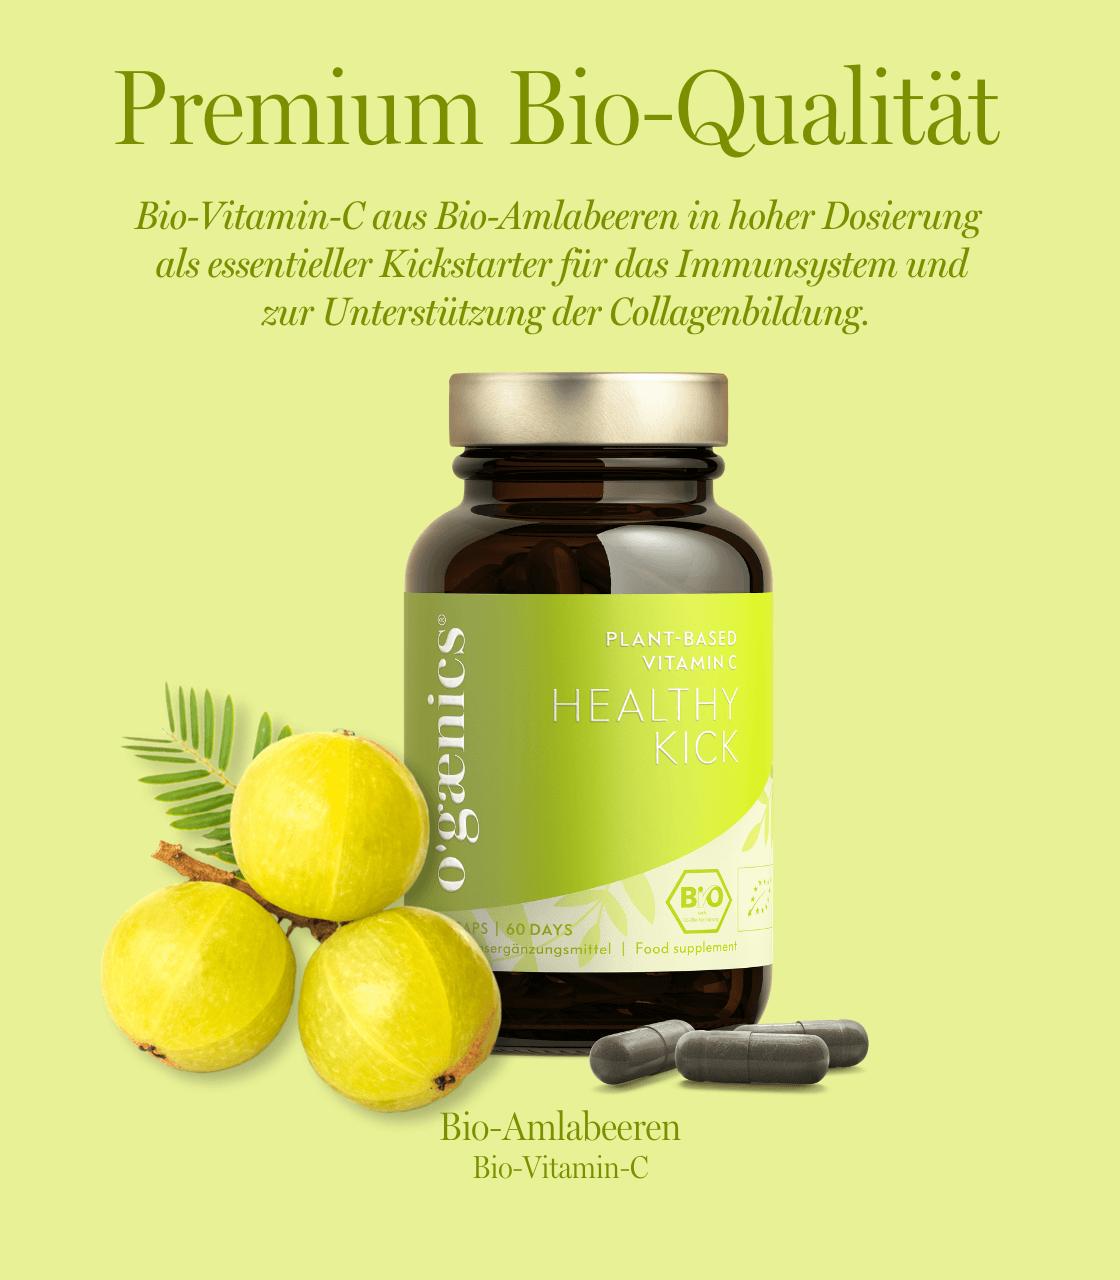 healthykick-plant-based-bio-vitamin-c-nahrungsergaenzung